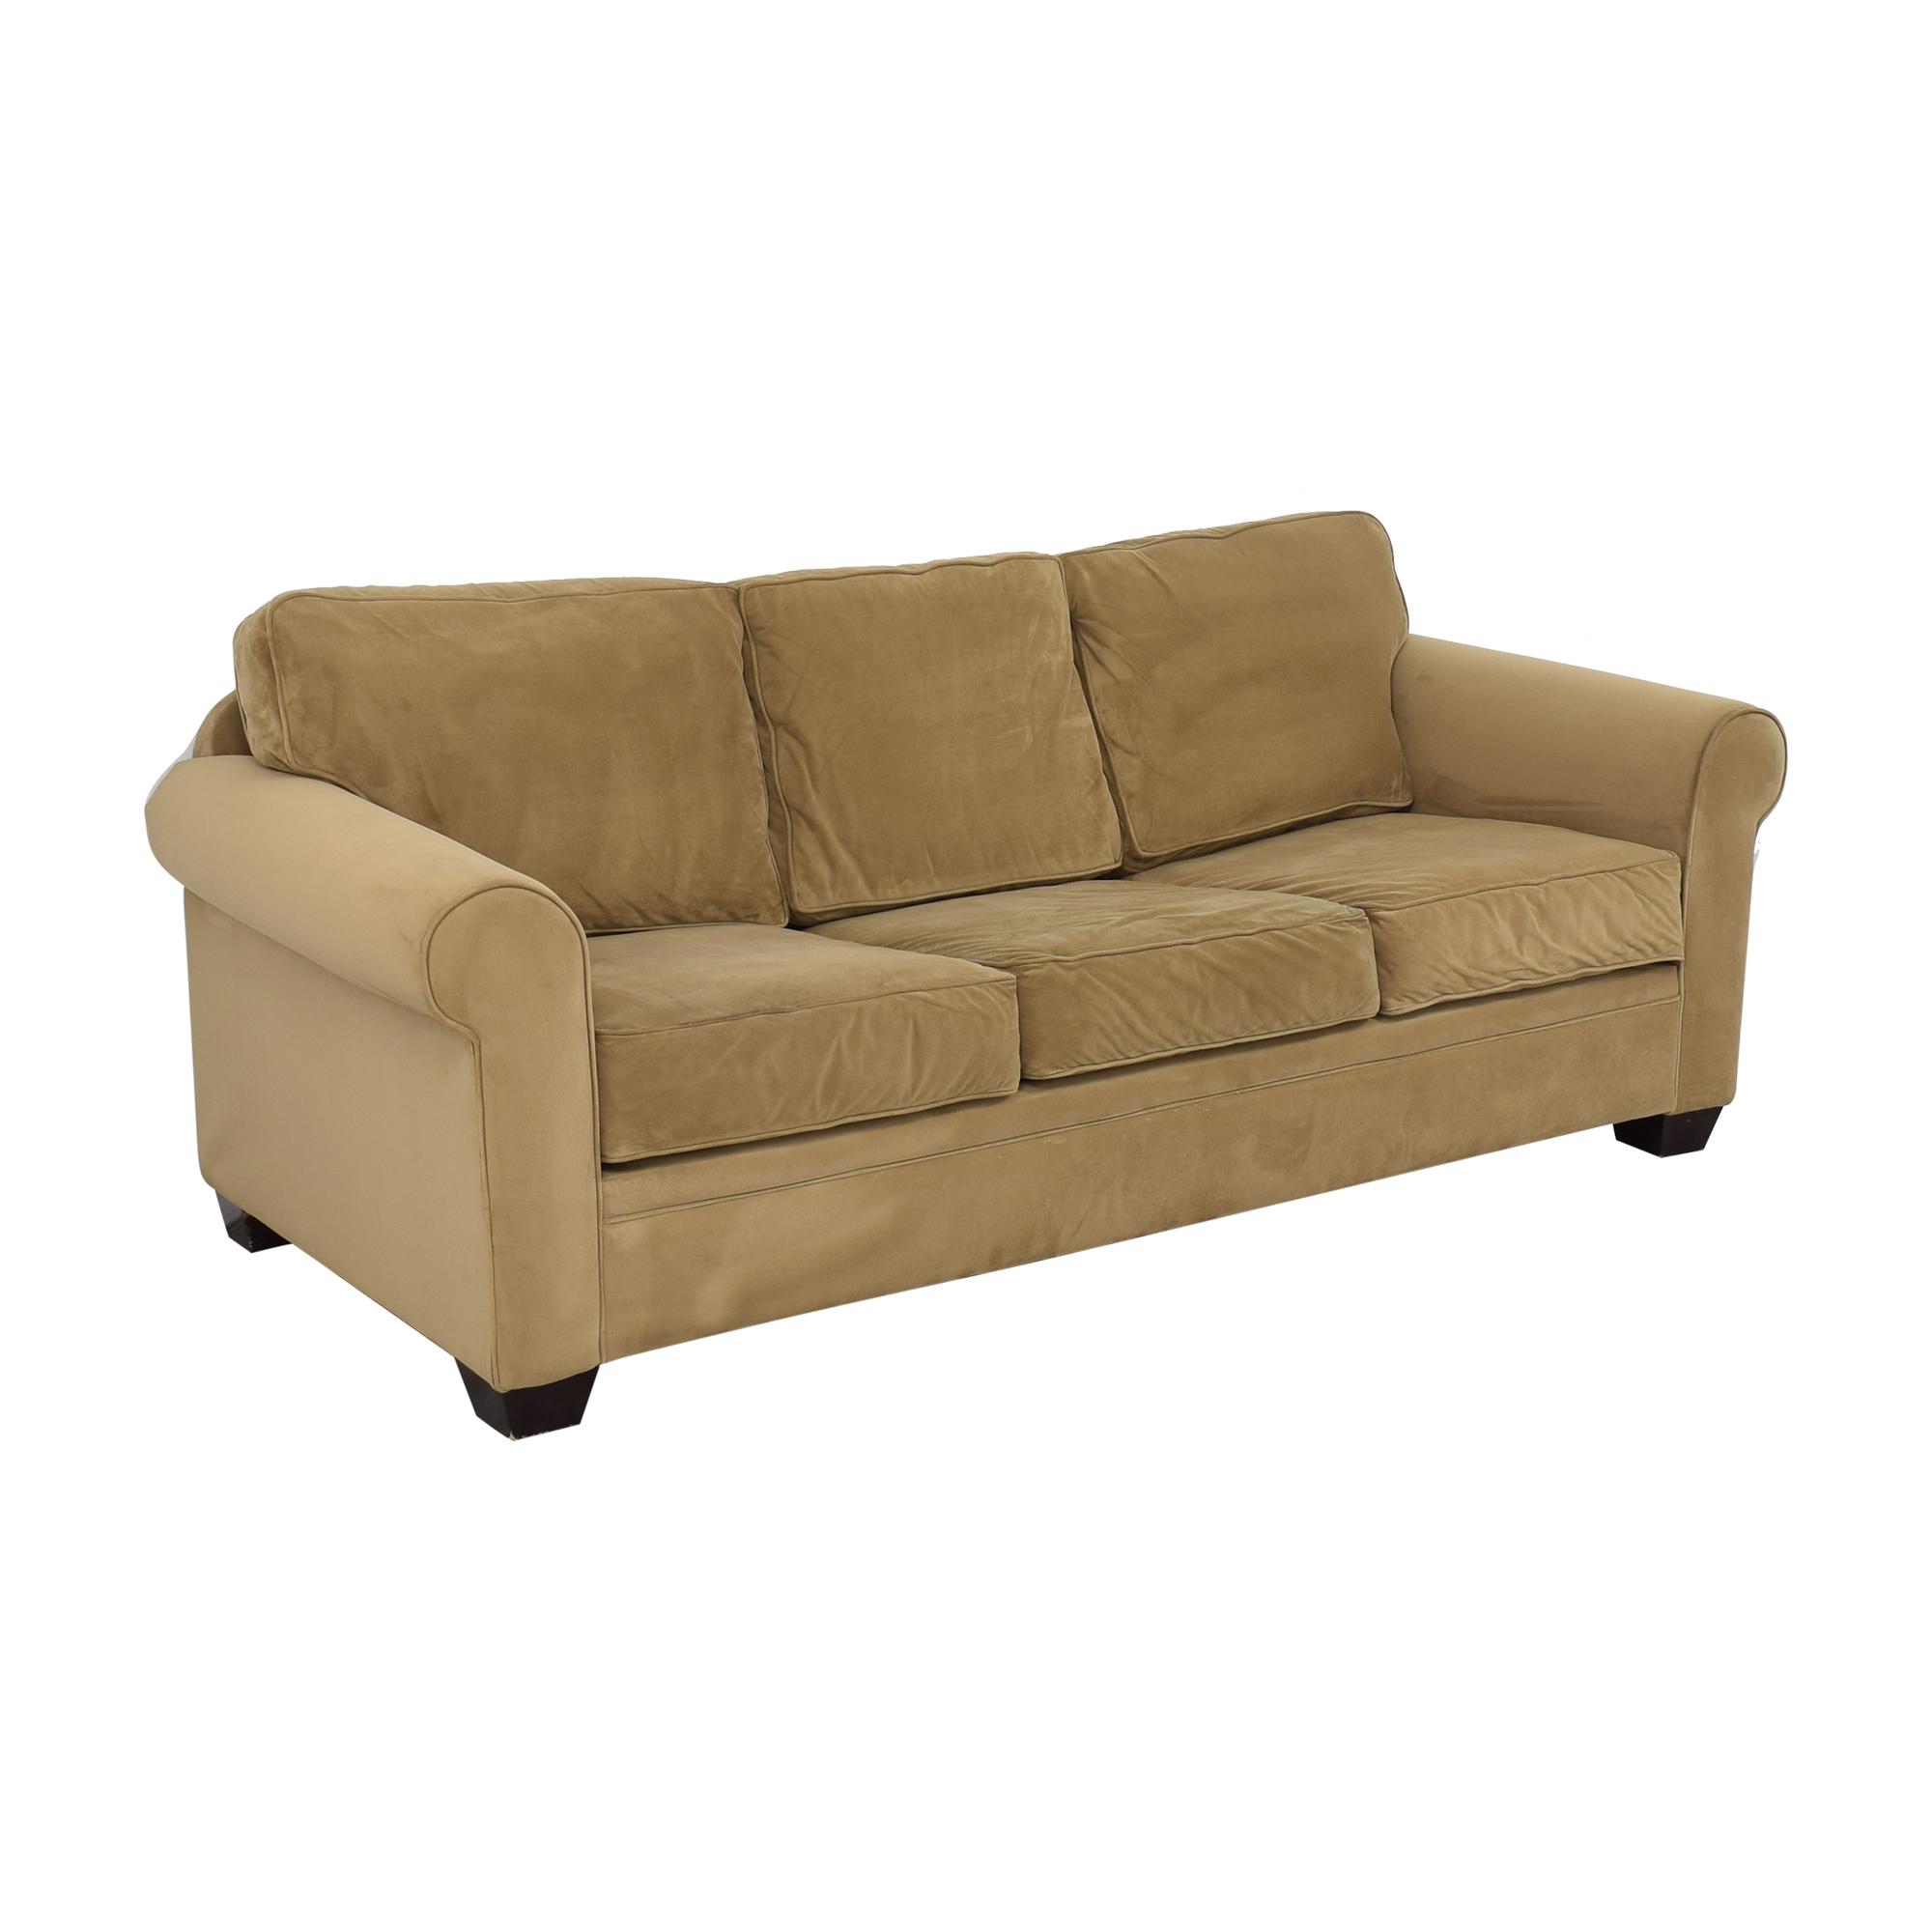 Macy's Macy's Tan Sofa Bed second hand